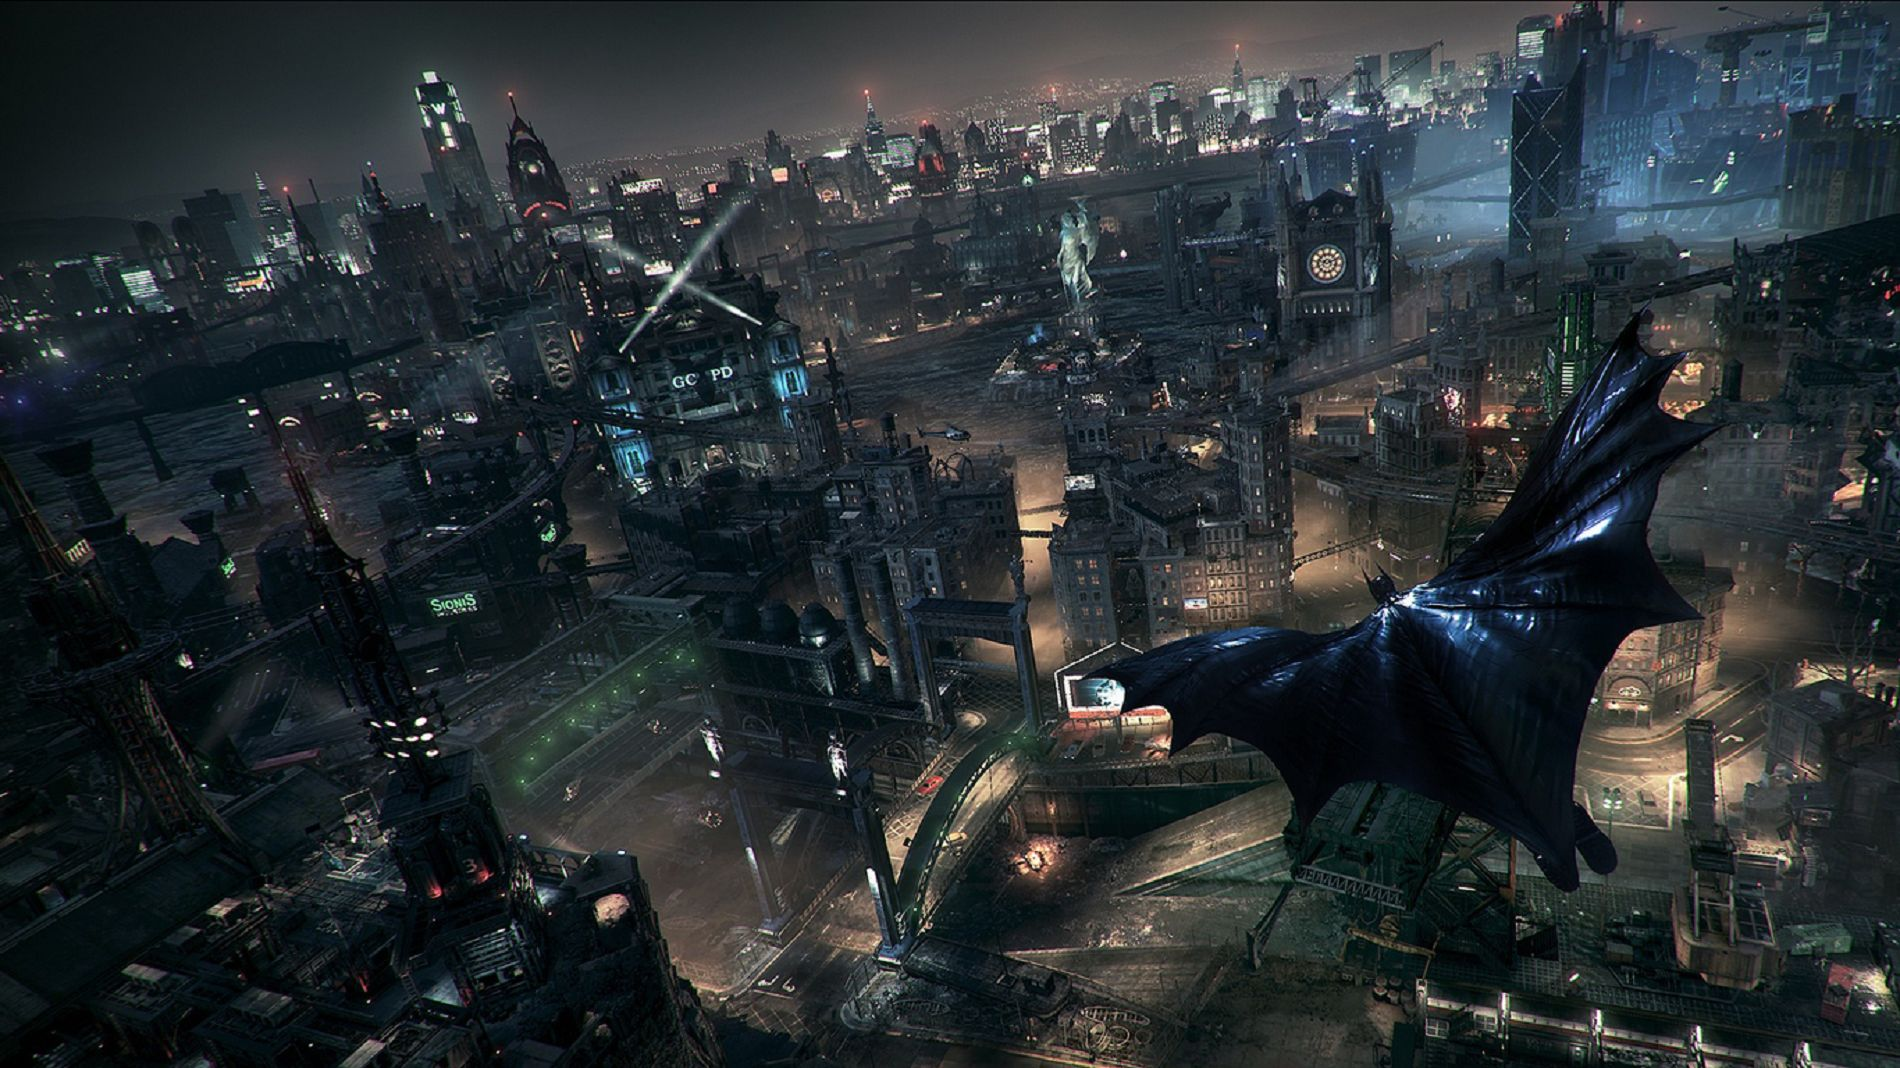 Batman Arkham Knight Hd Wallpaper Wallpapersafari